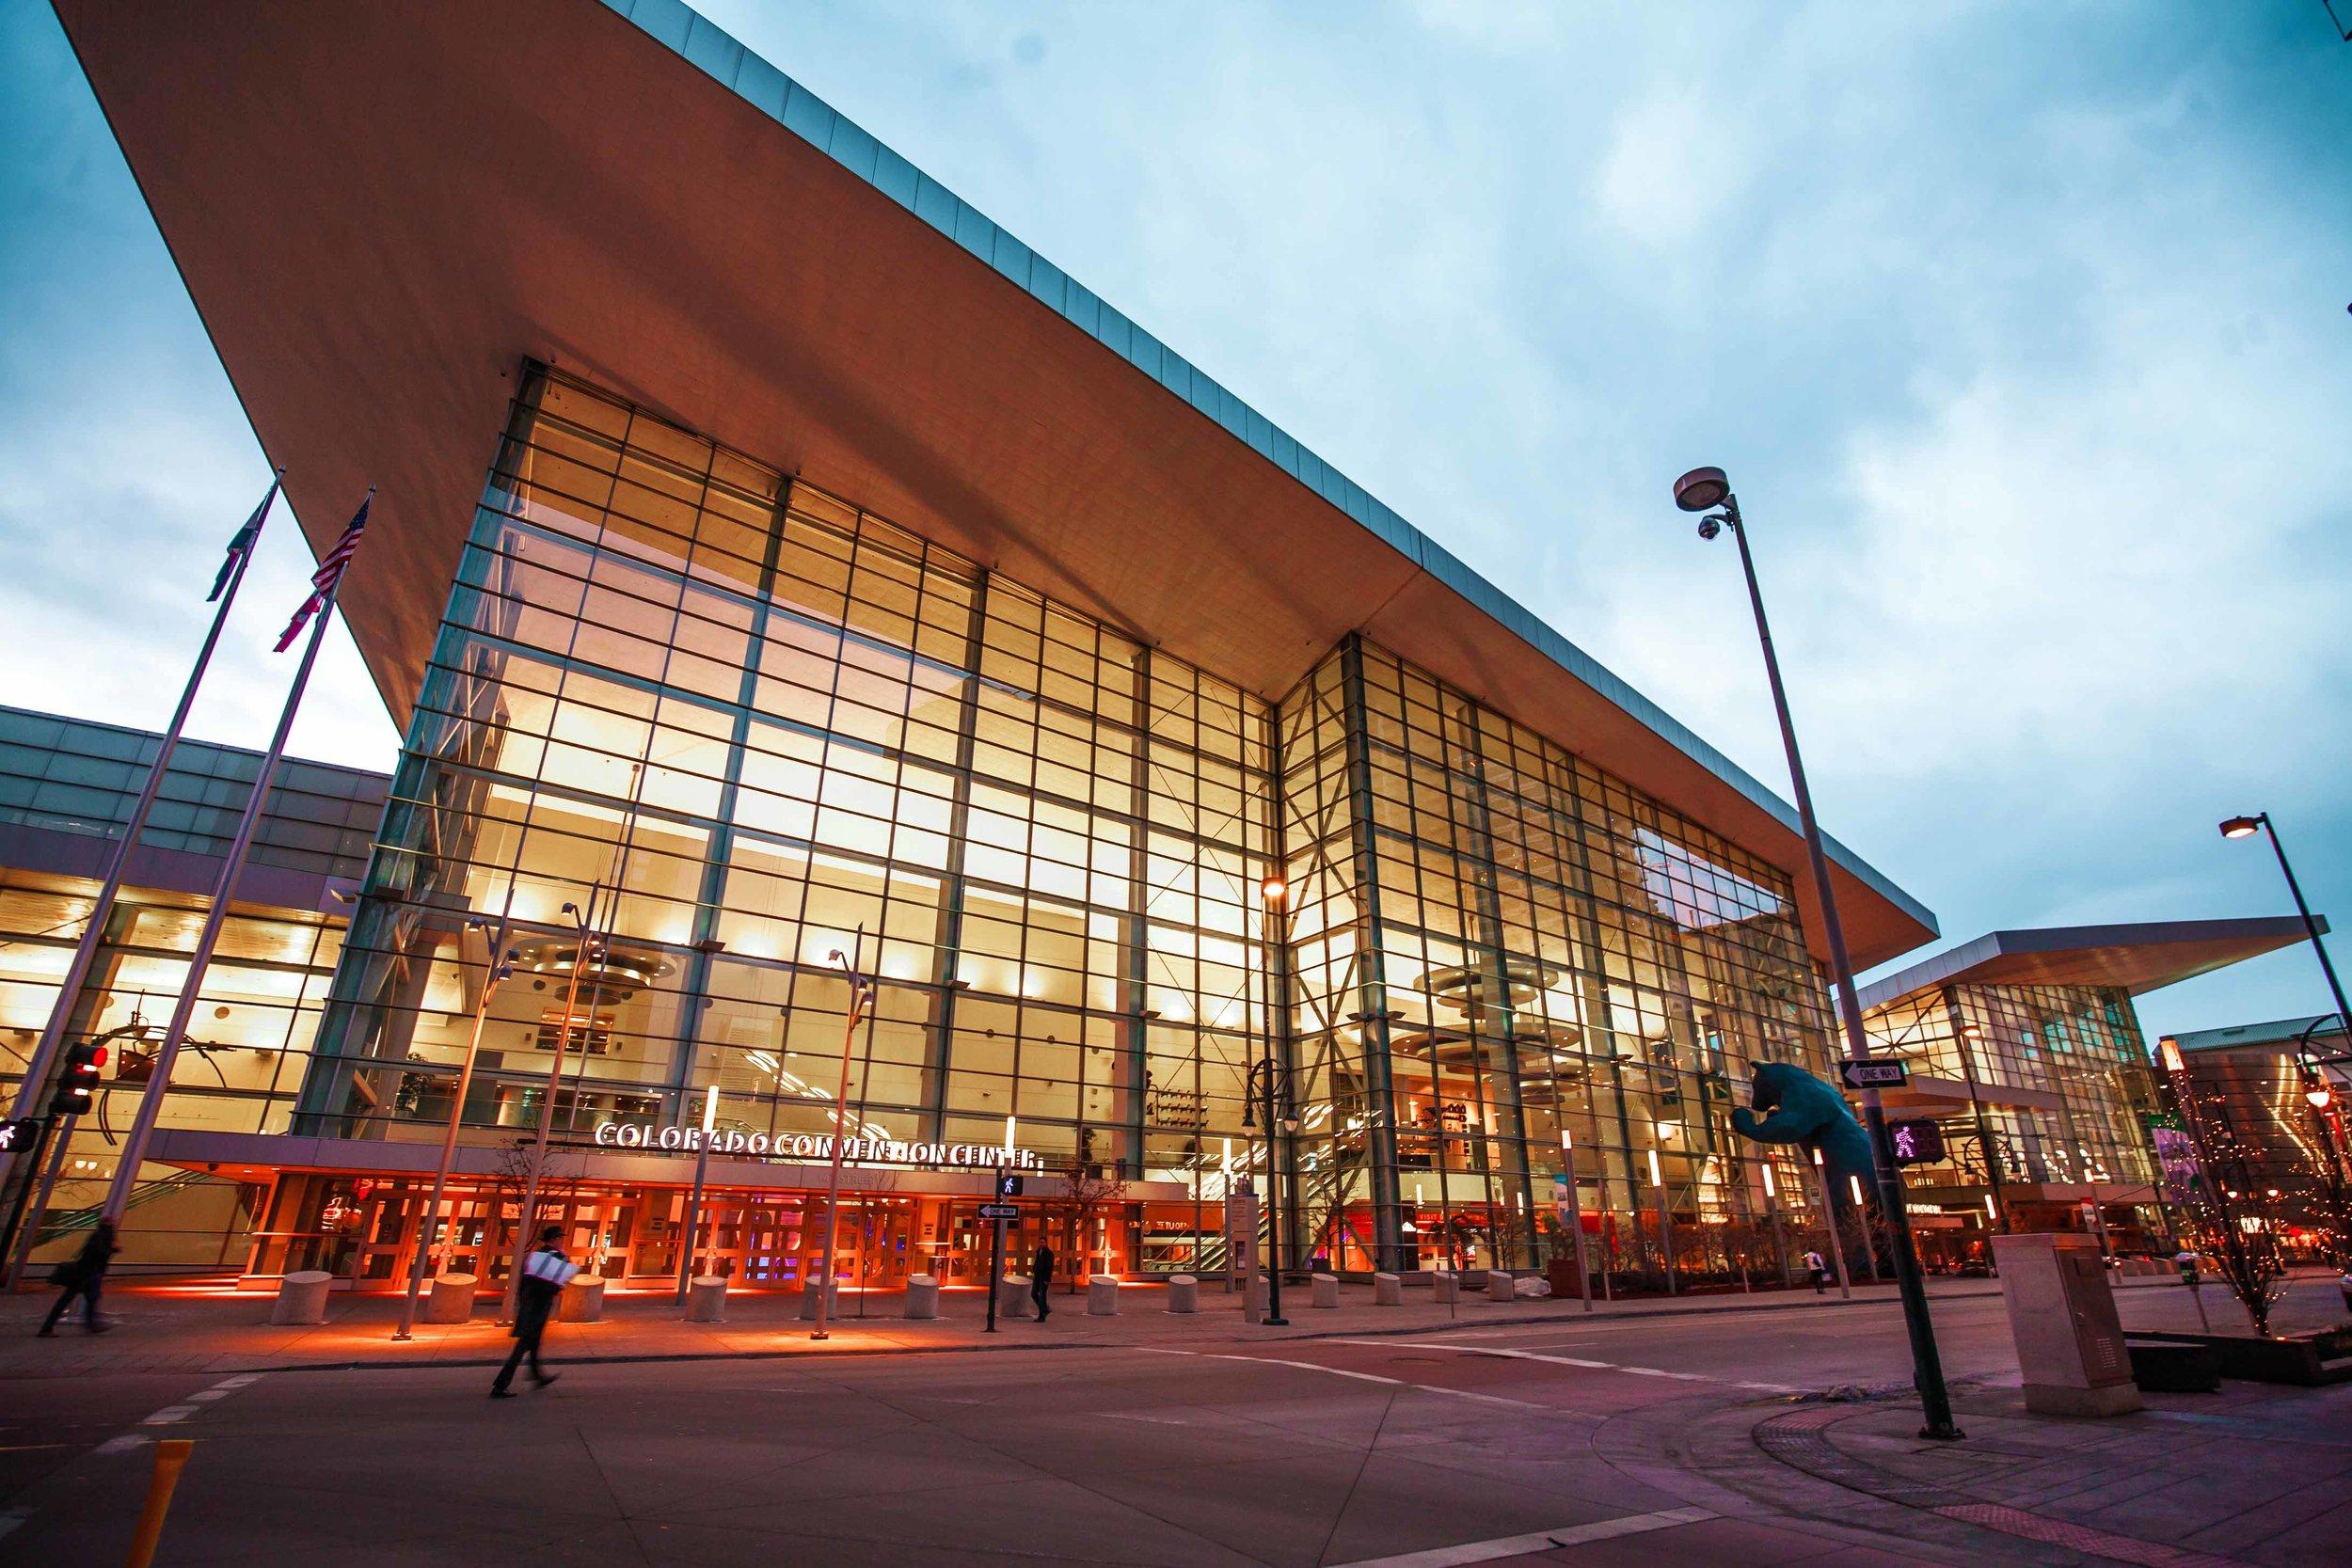 Convention Center at the Blue Hour - Denver 2017